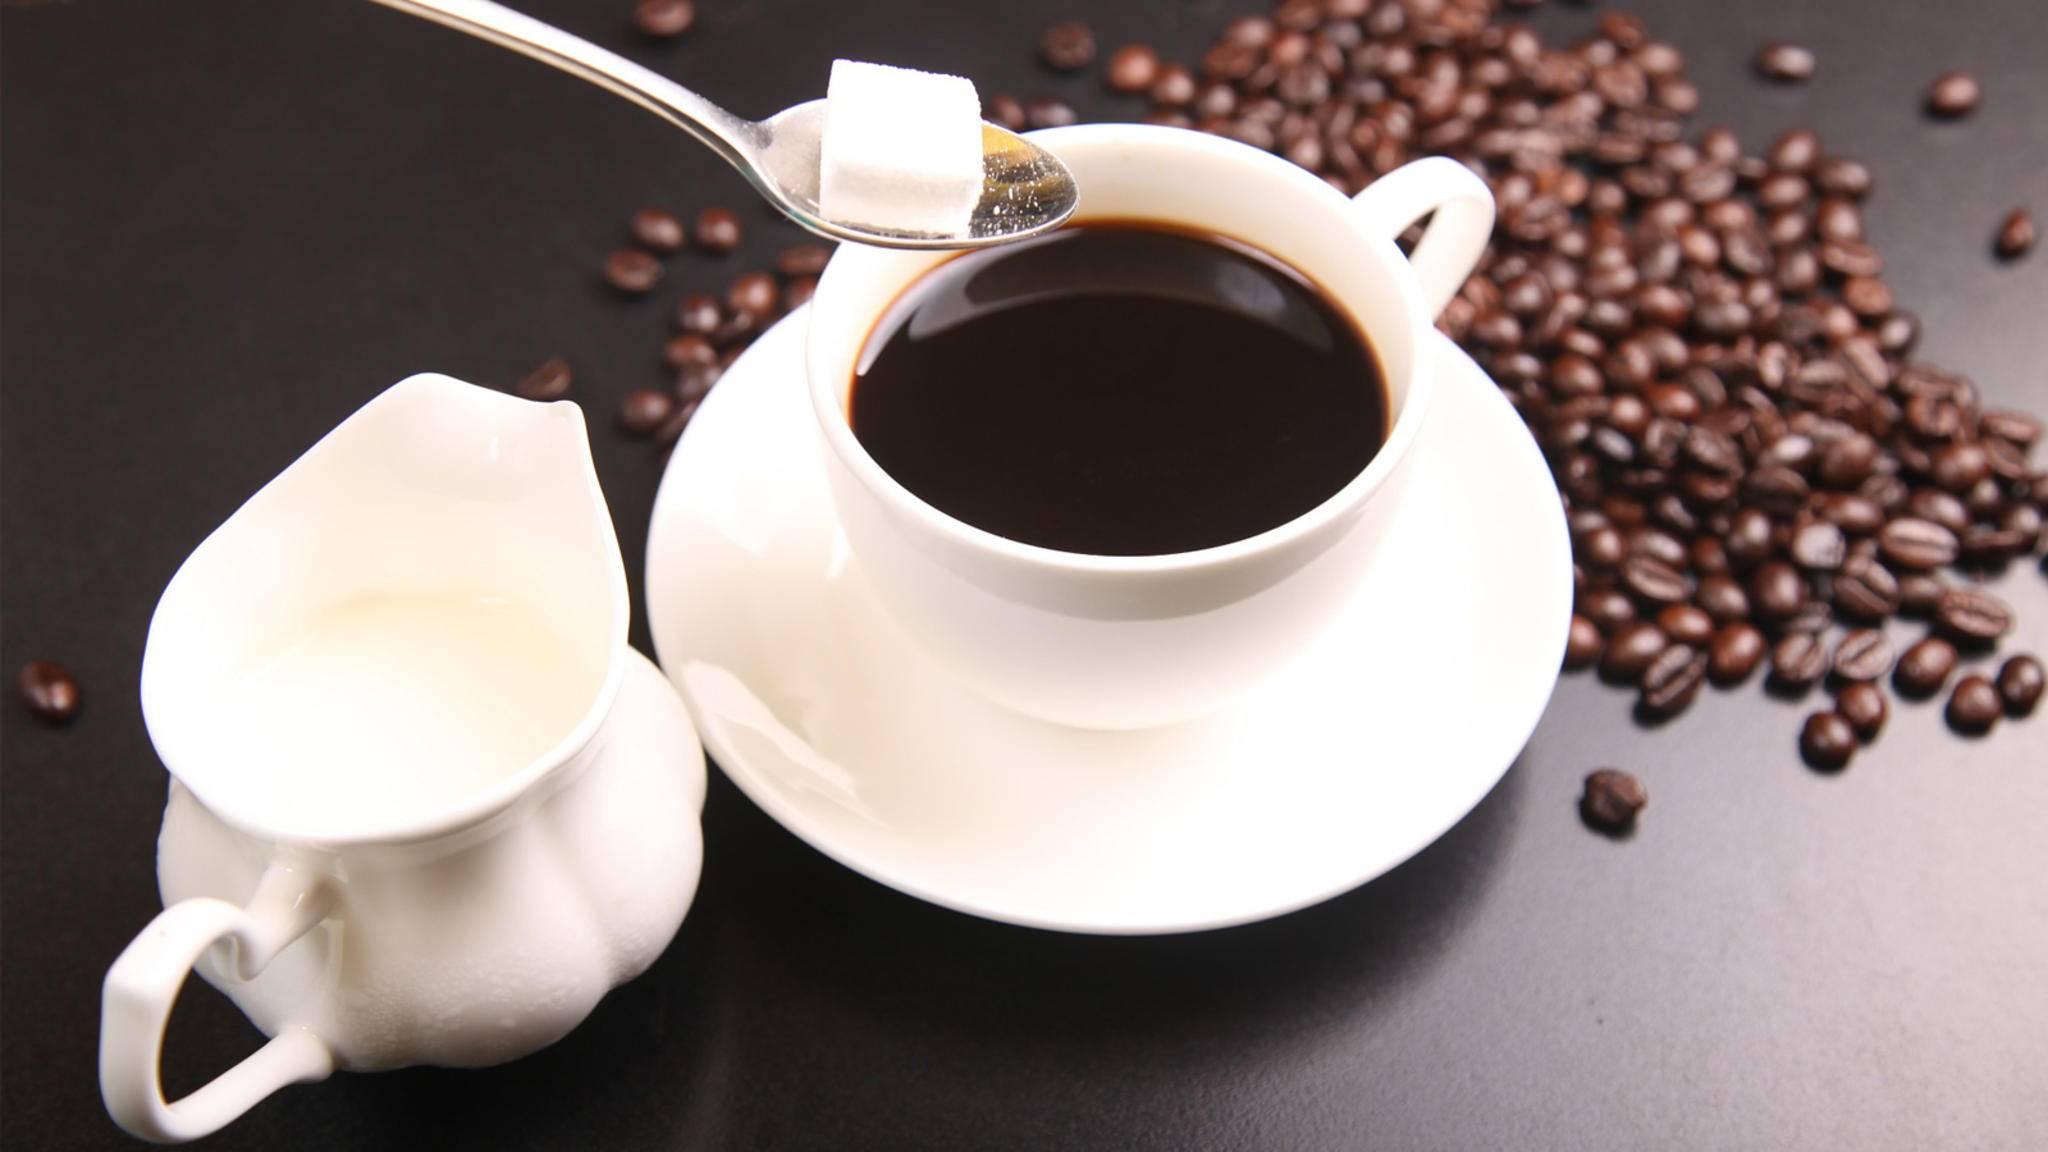 Kaffee-Milch-Zucker_Pixabay